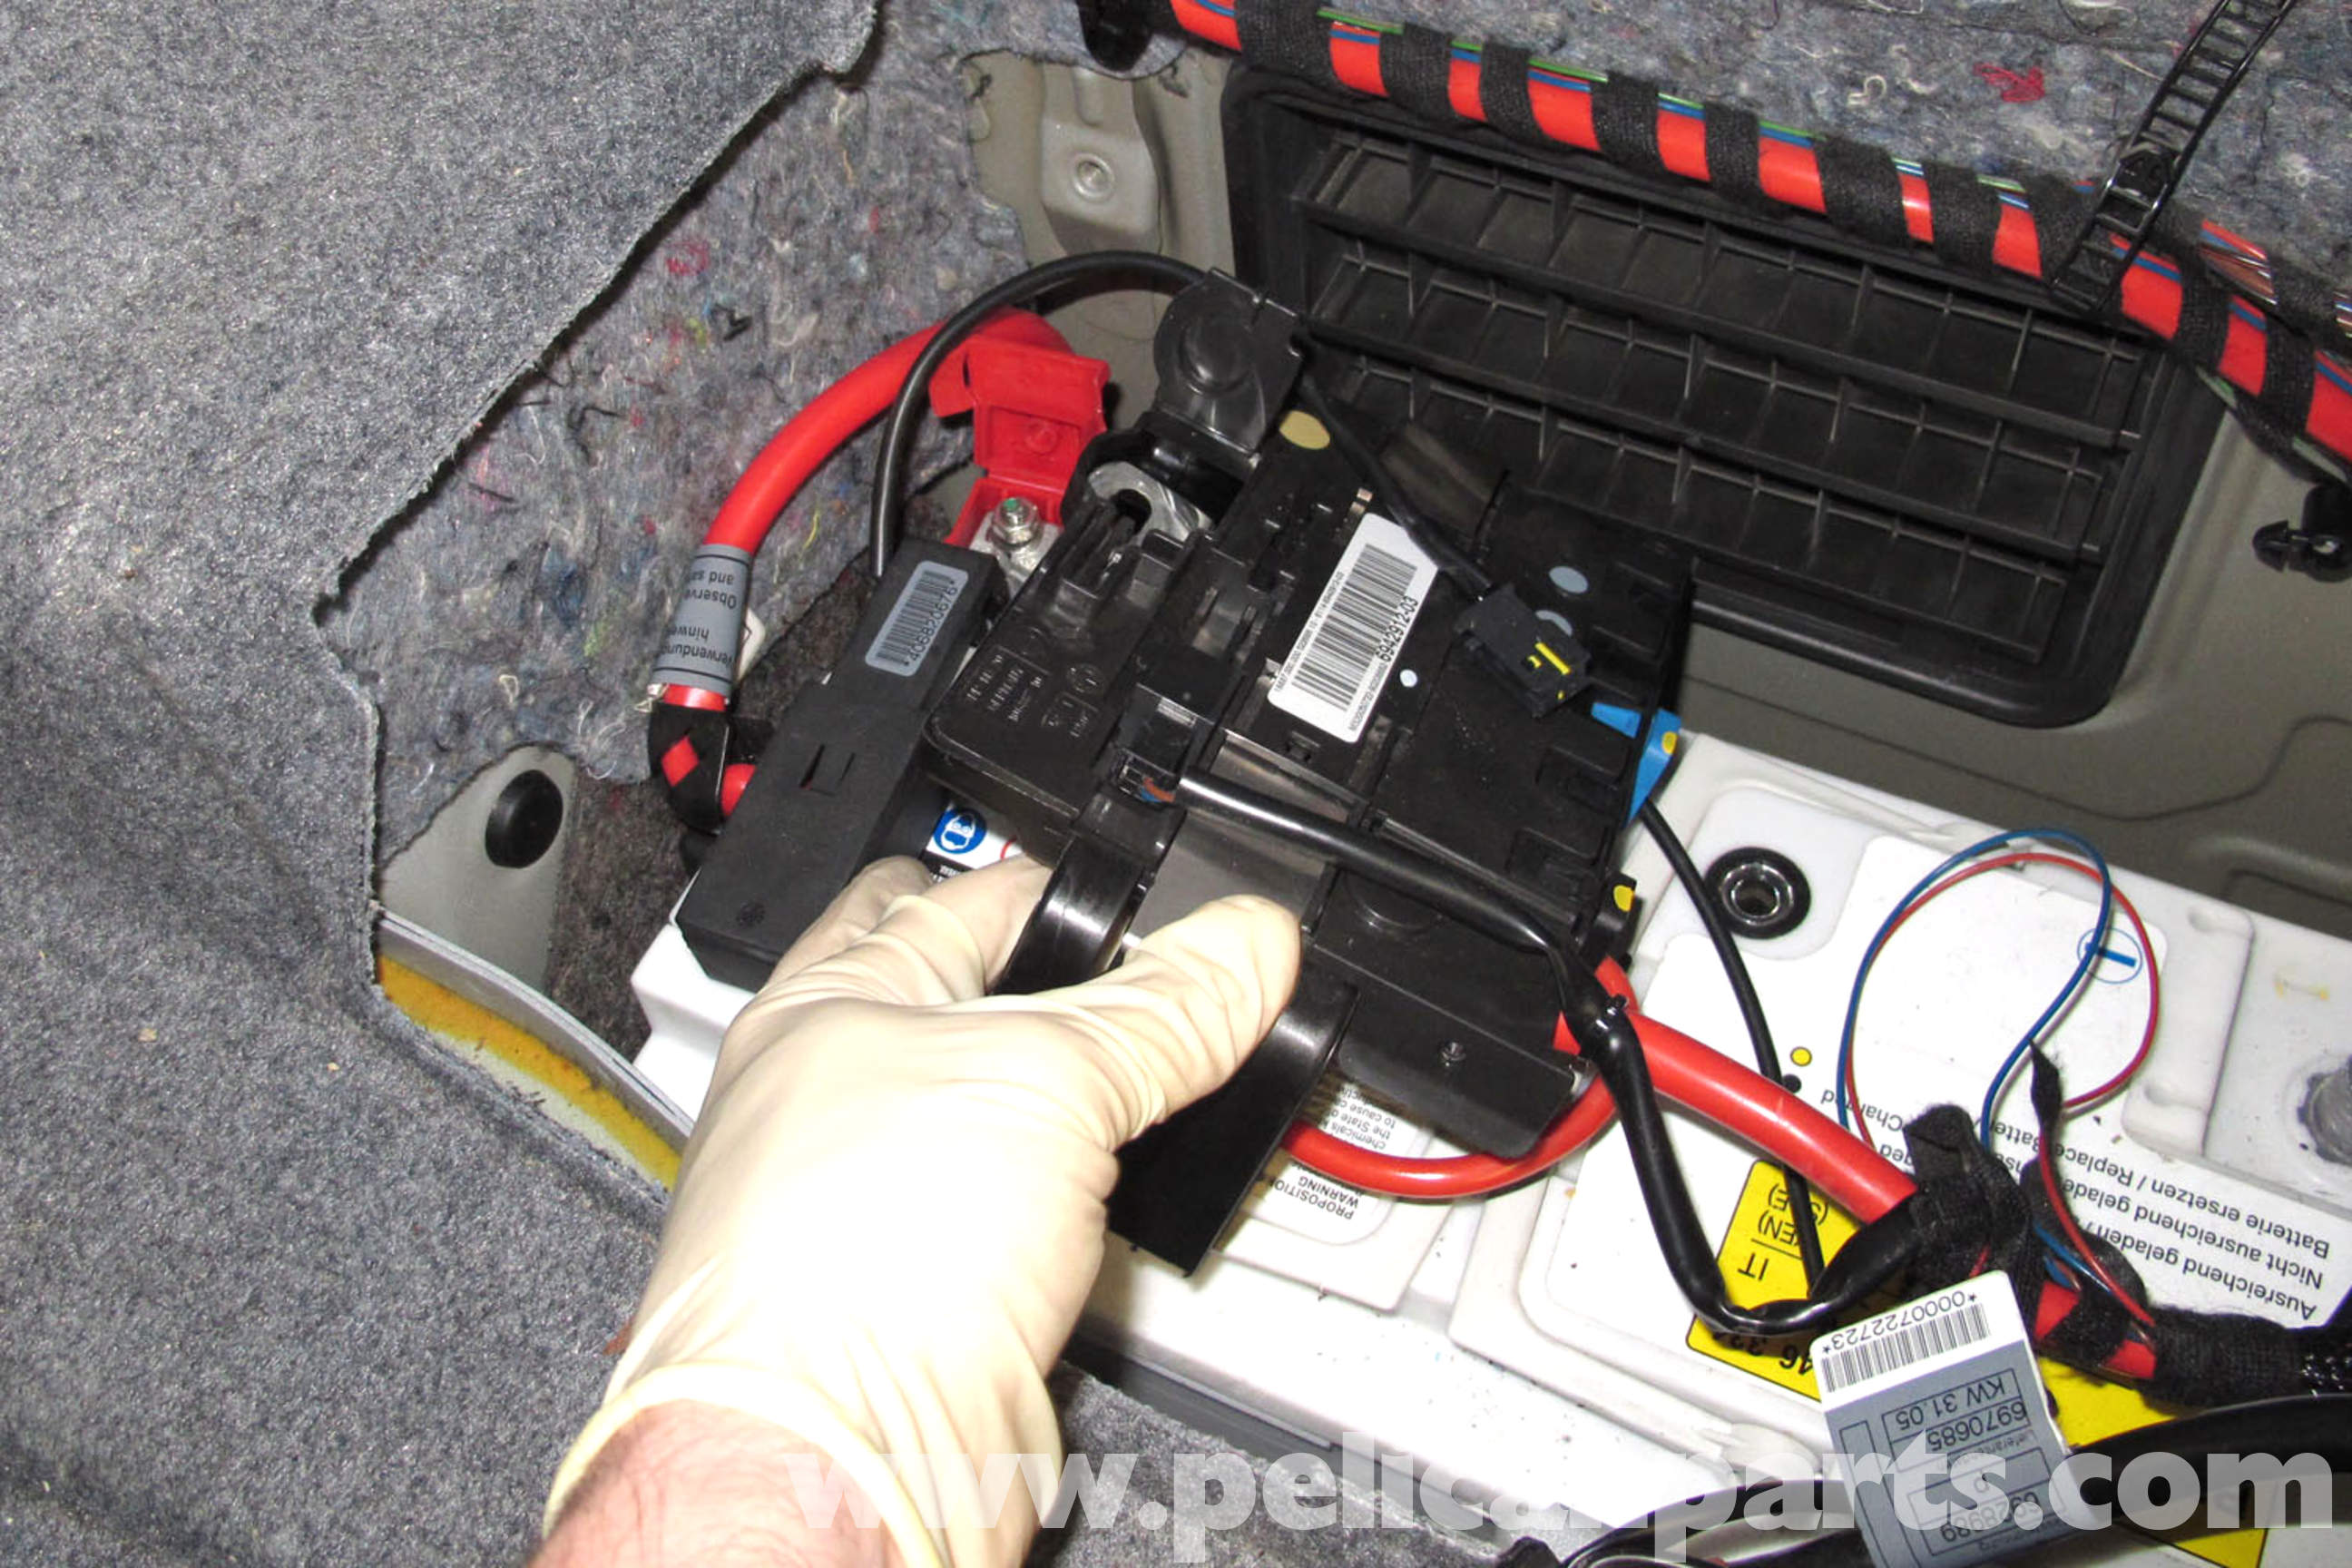 e36 wiring diagram ford radio bmw e90 battery replacement   e91, e92, e93 pelican parts diy maintenance article